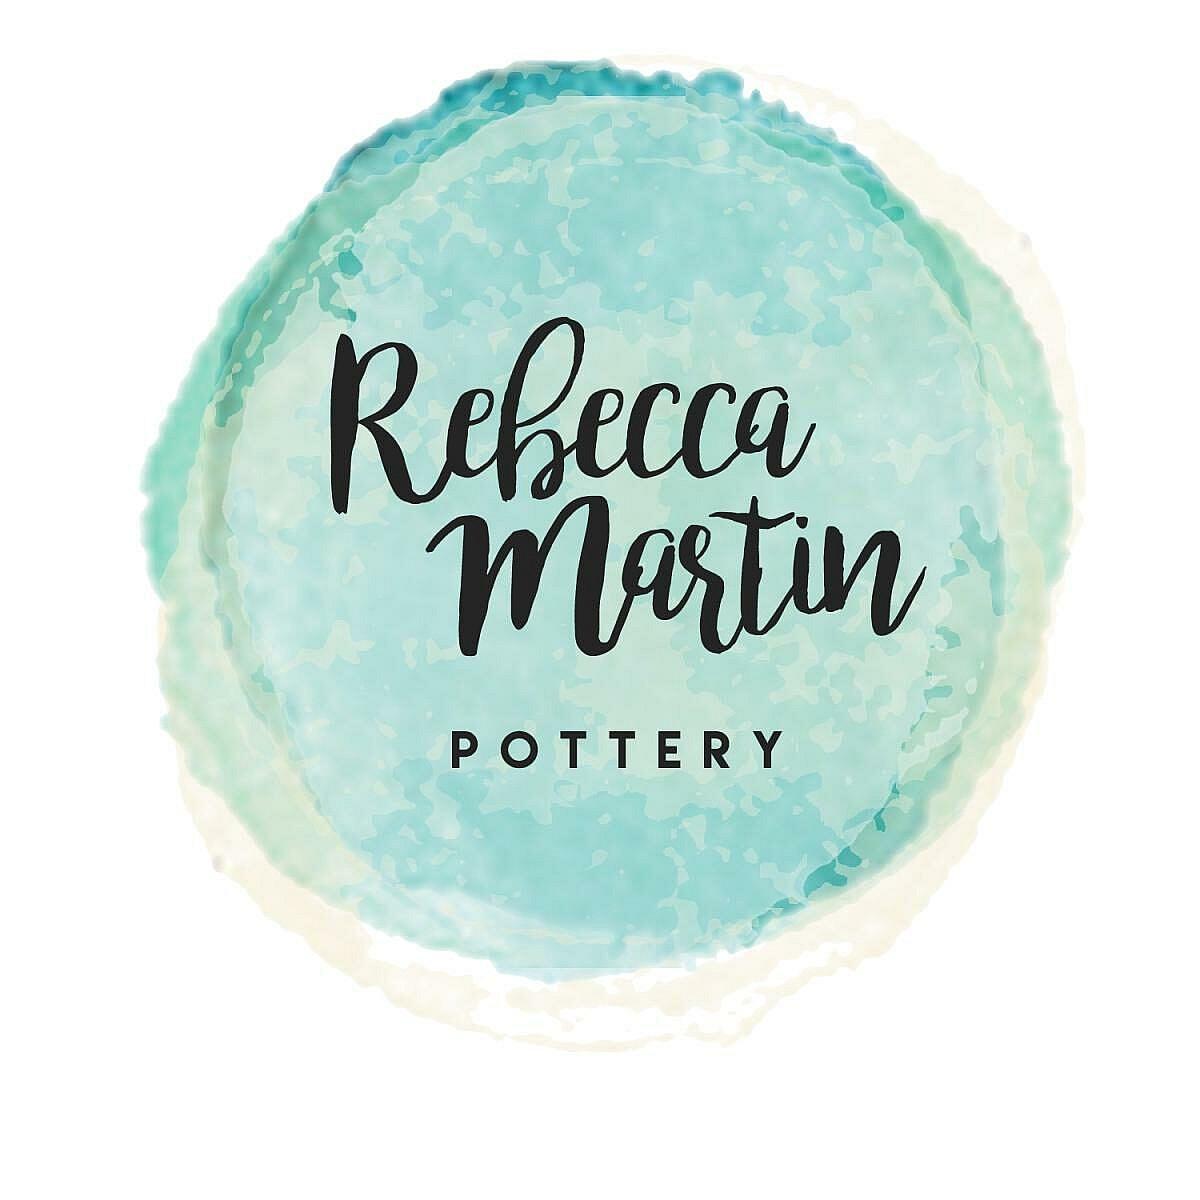 RebeccaMartinPottery - ArtsCraftVendorApplication - 24717